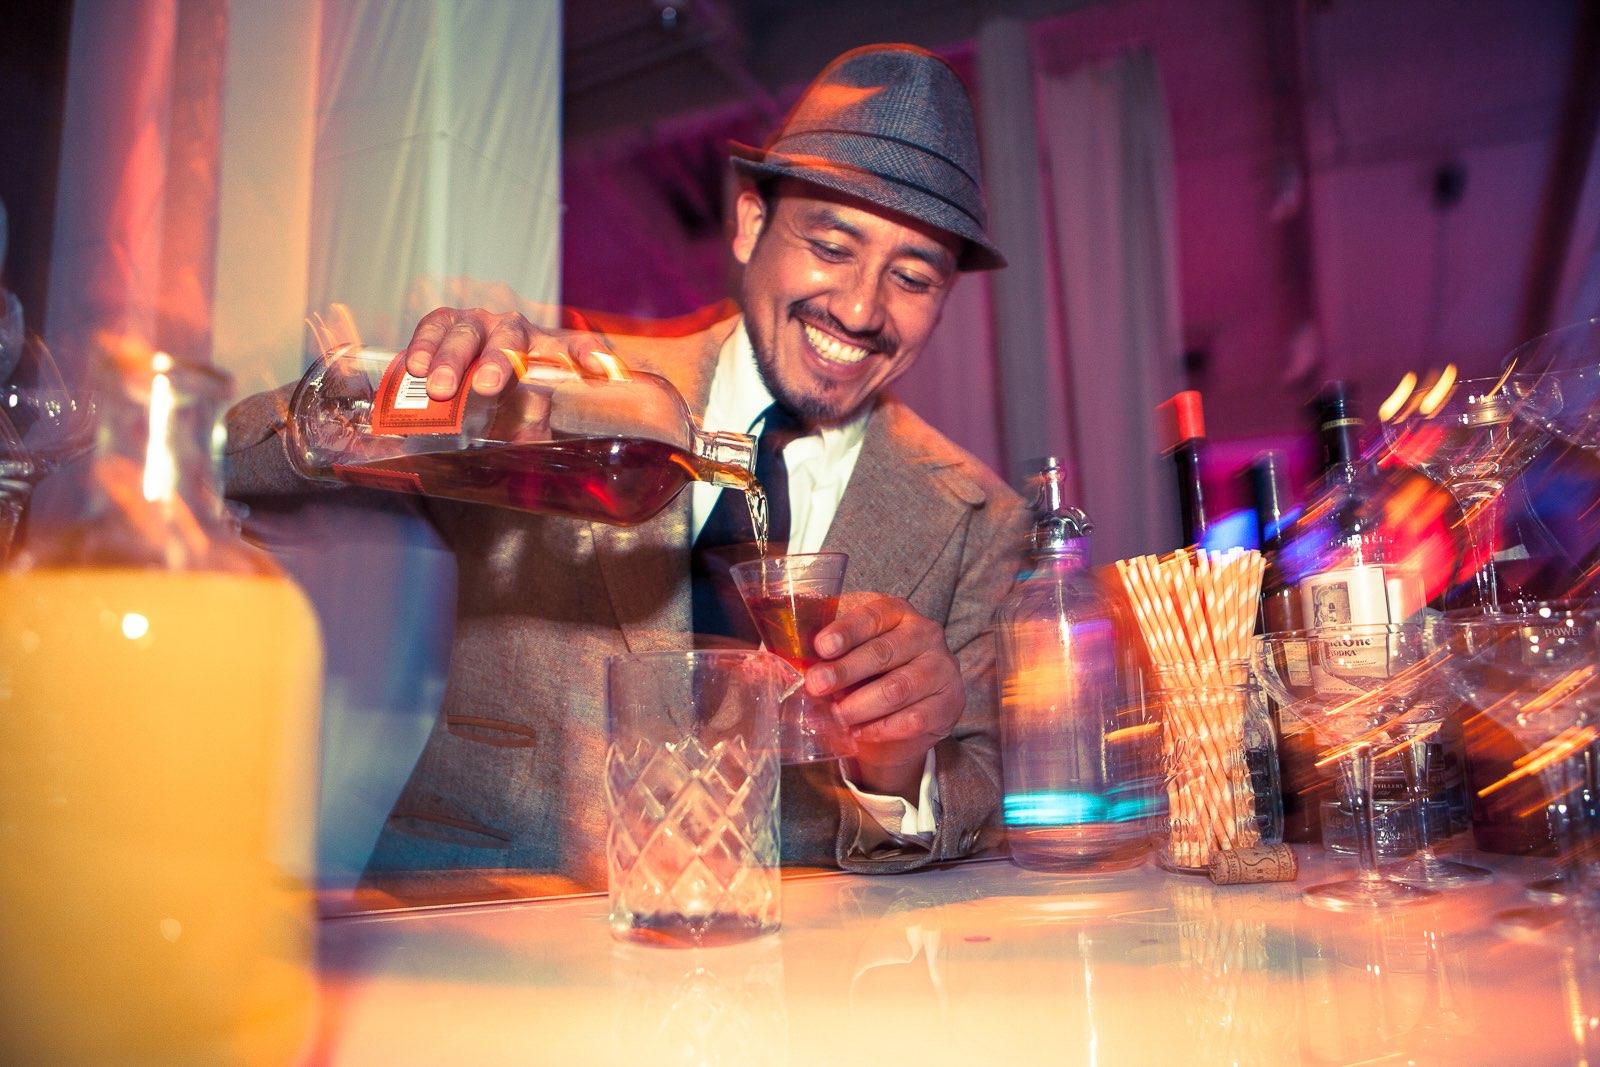 7x7-magazine-bartender Nightlife